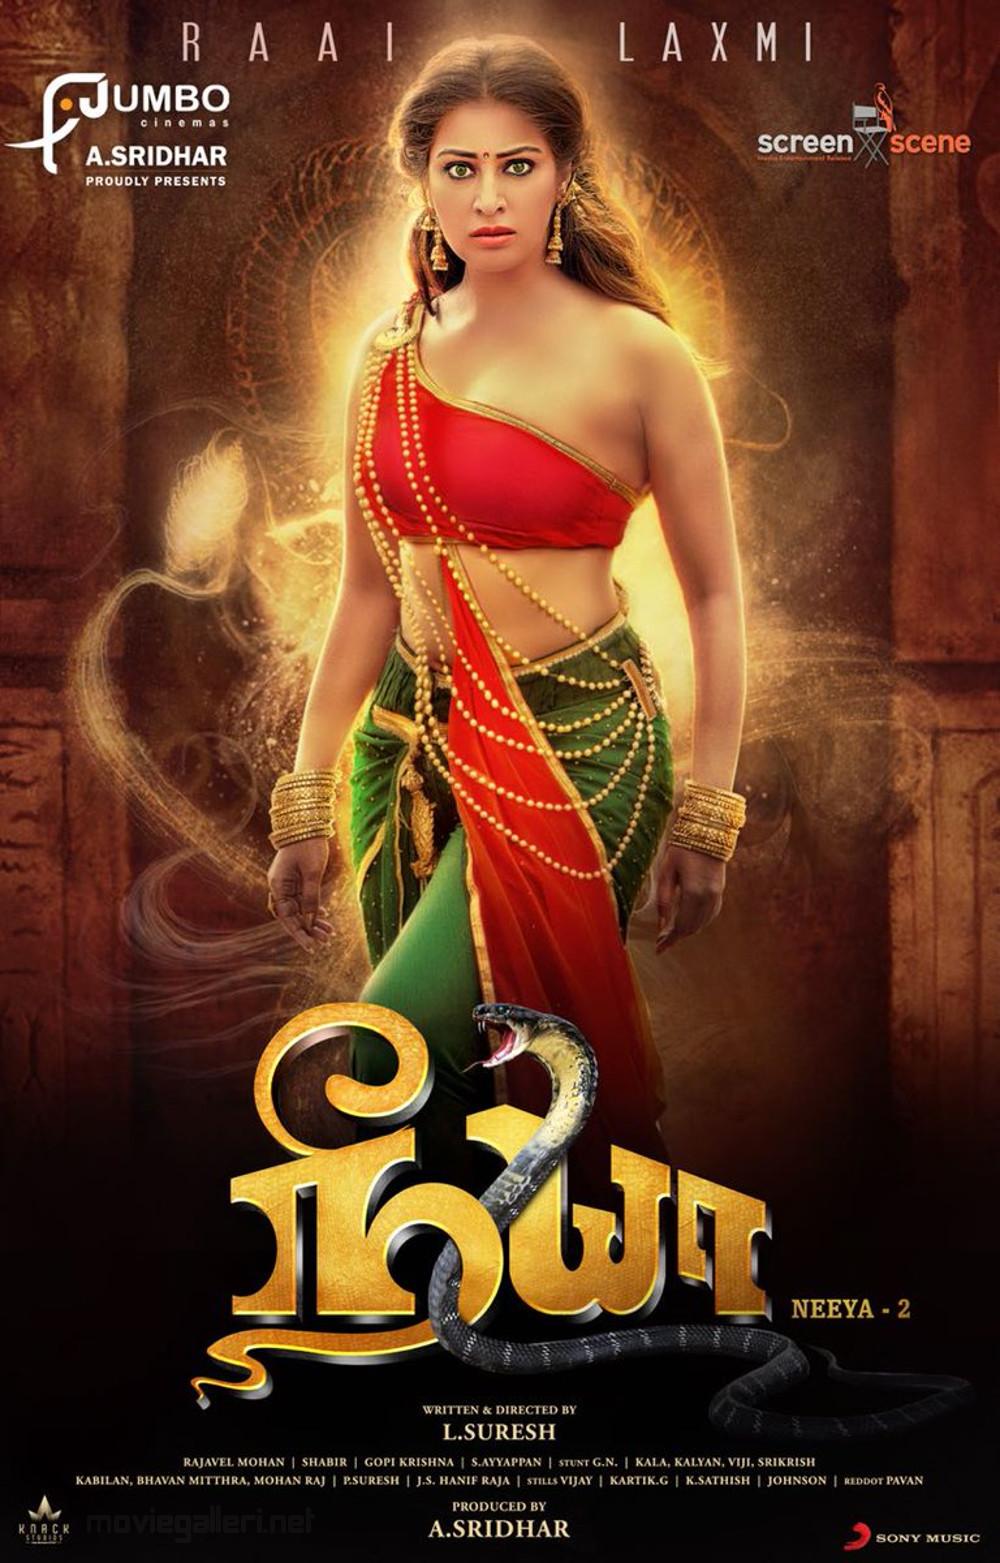 Actress Raai Laxmi Neeya 2 Movie First Look Poster